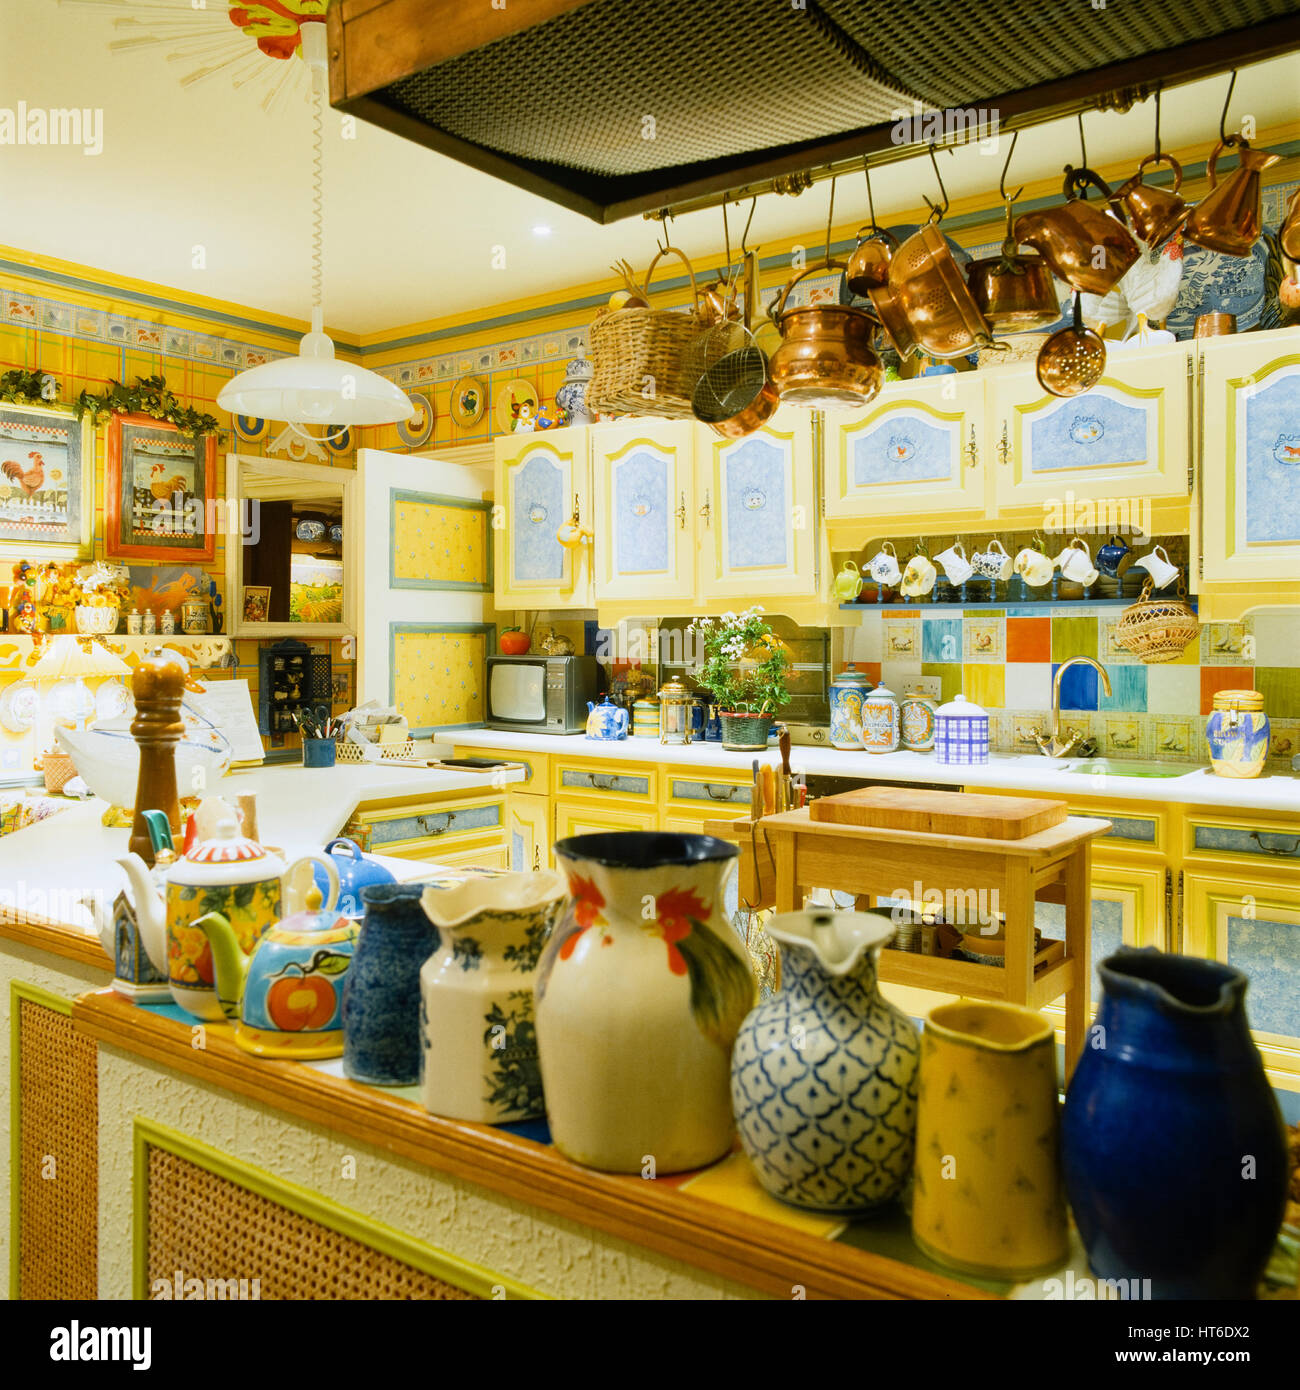 Küche im Retro-Stil gelb Stockfoto, Bild: 135366954 - Alamy